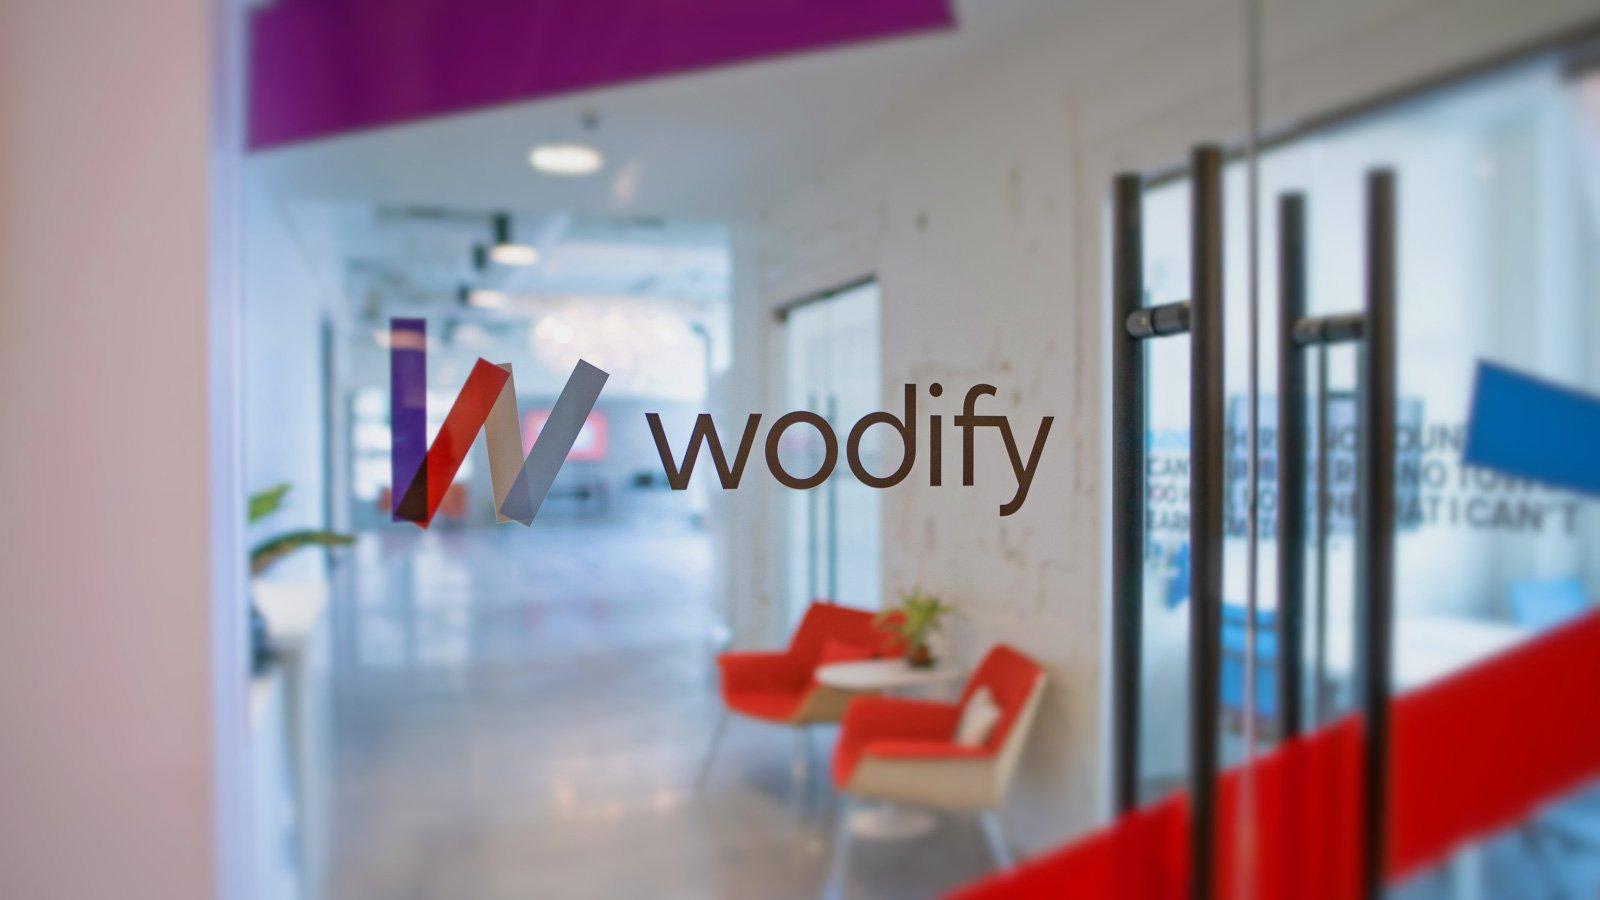 Multiple vulnerabilities in Wodify fitness management platform